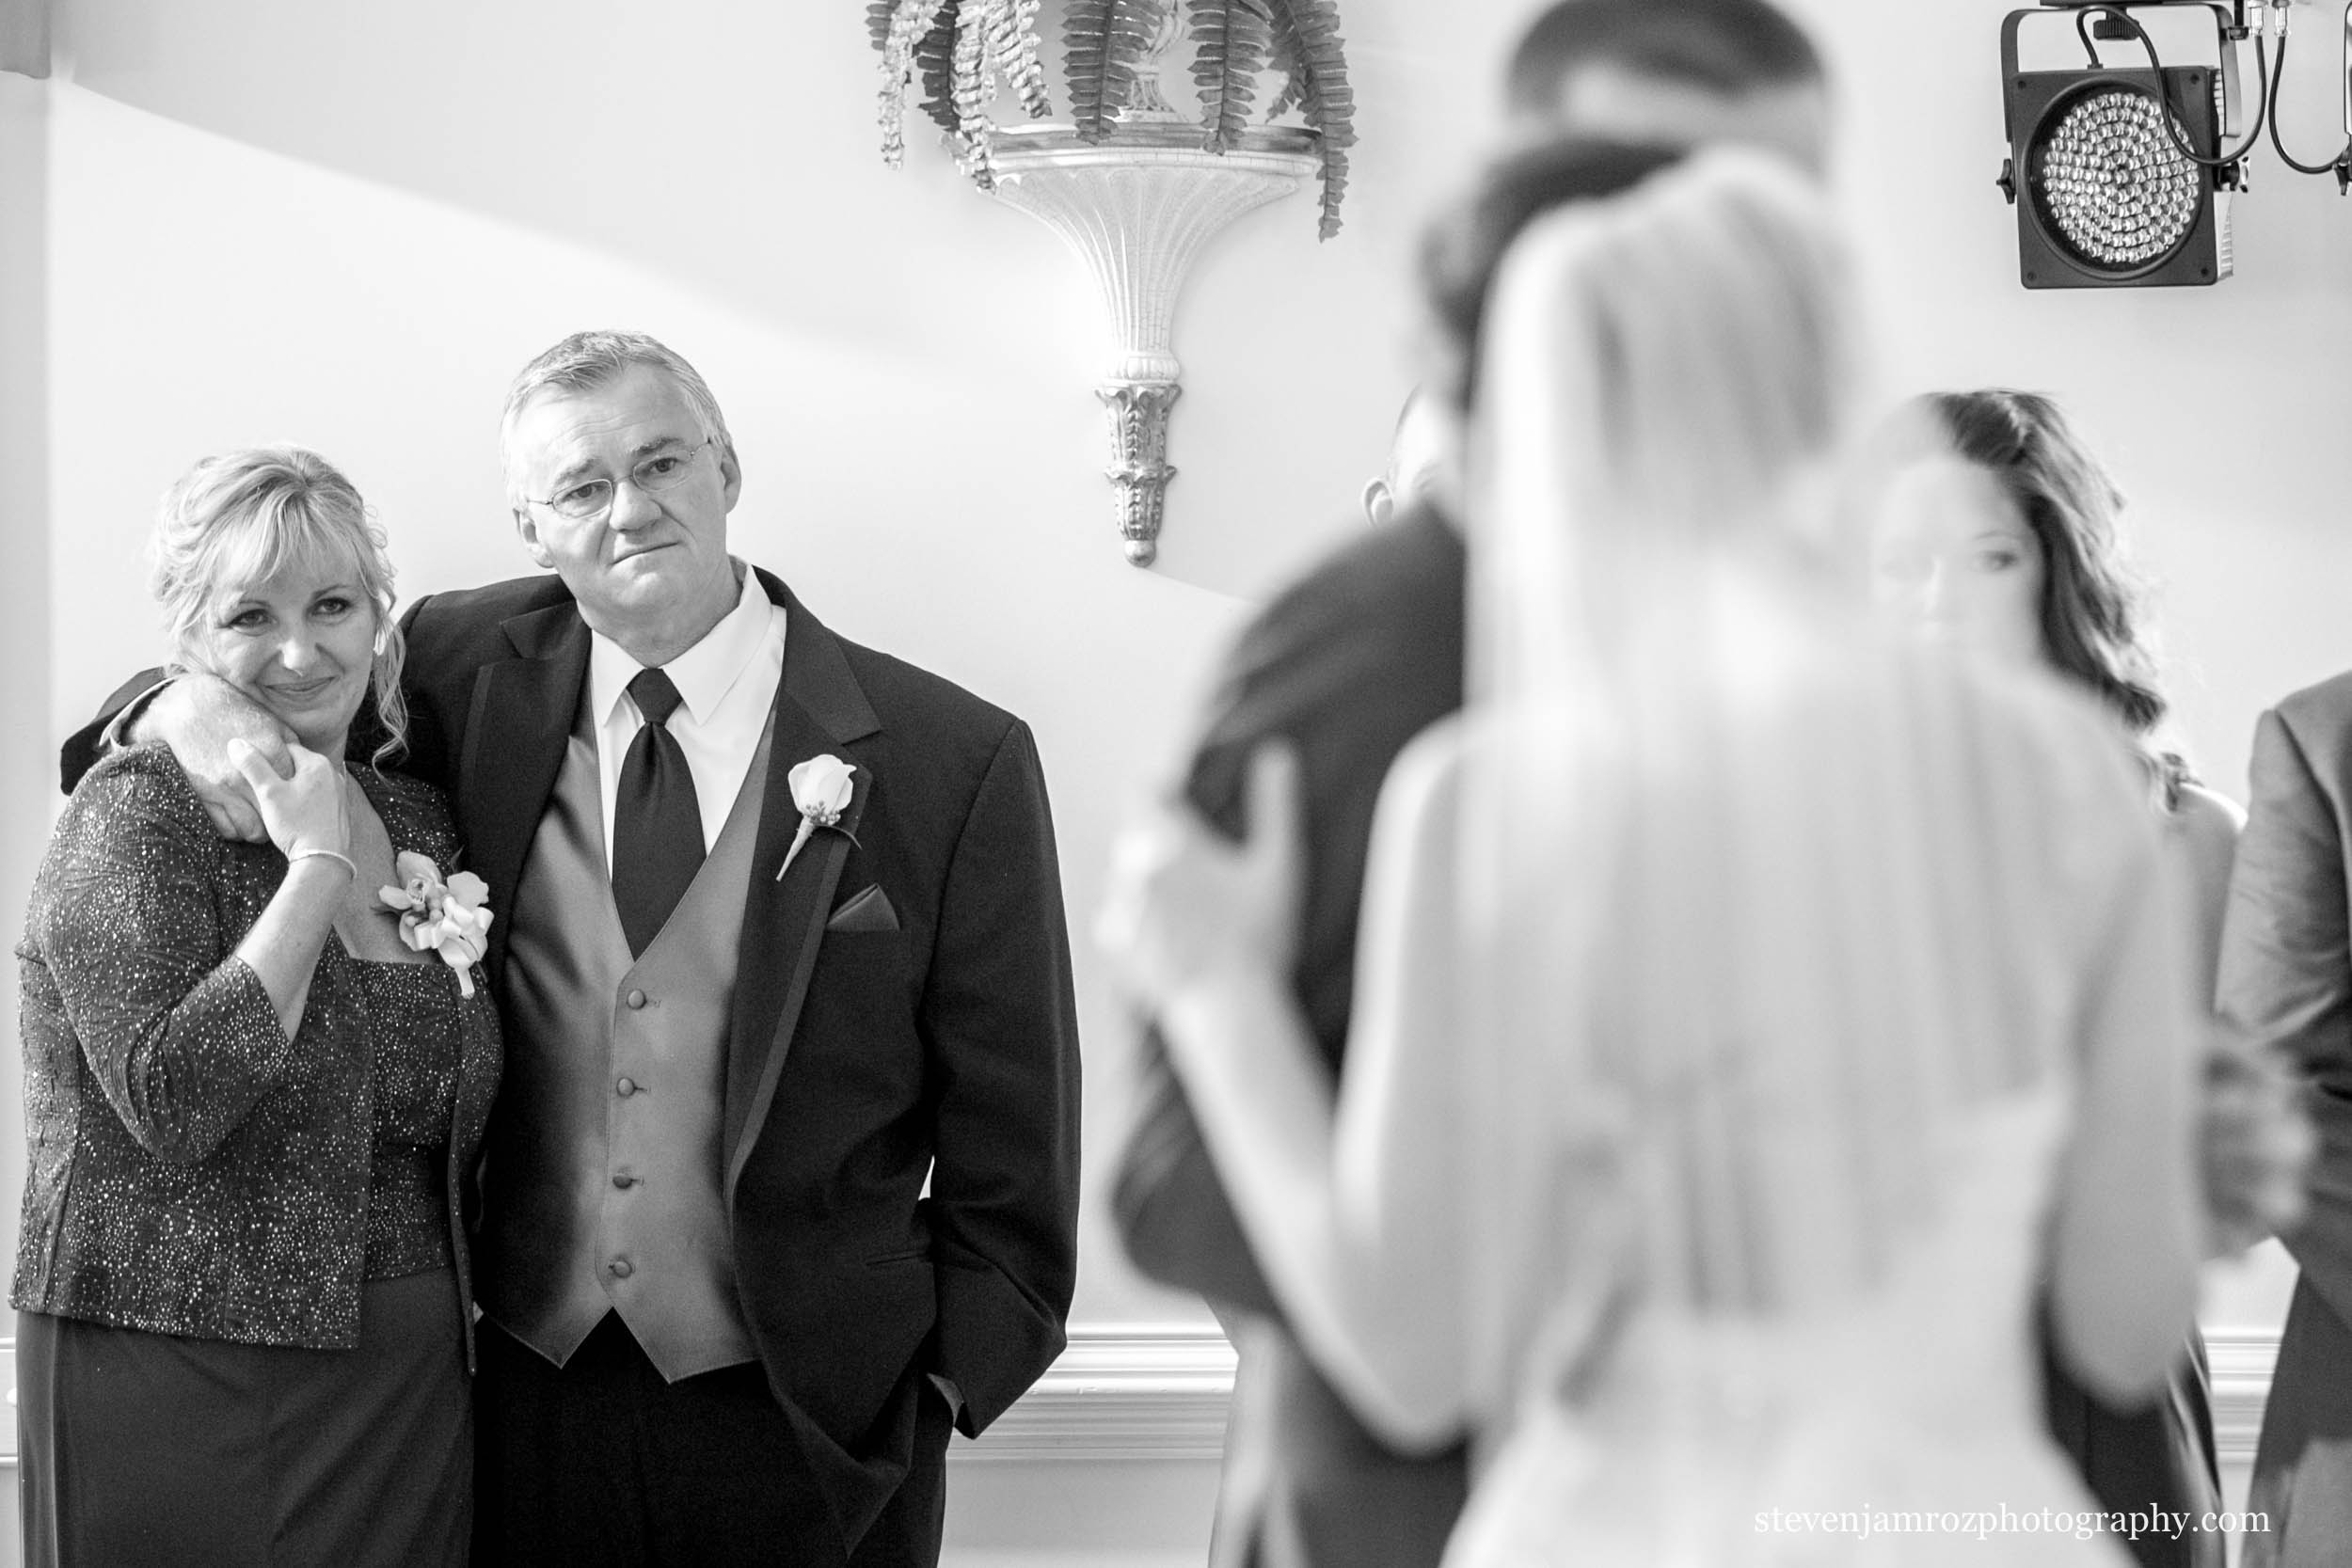 mom-dad-watch-first-dance-hudson-manor-steven-jamroz-photography-0254.jpg